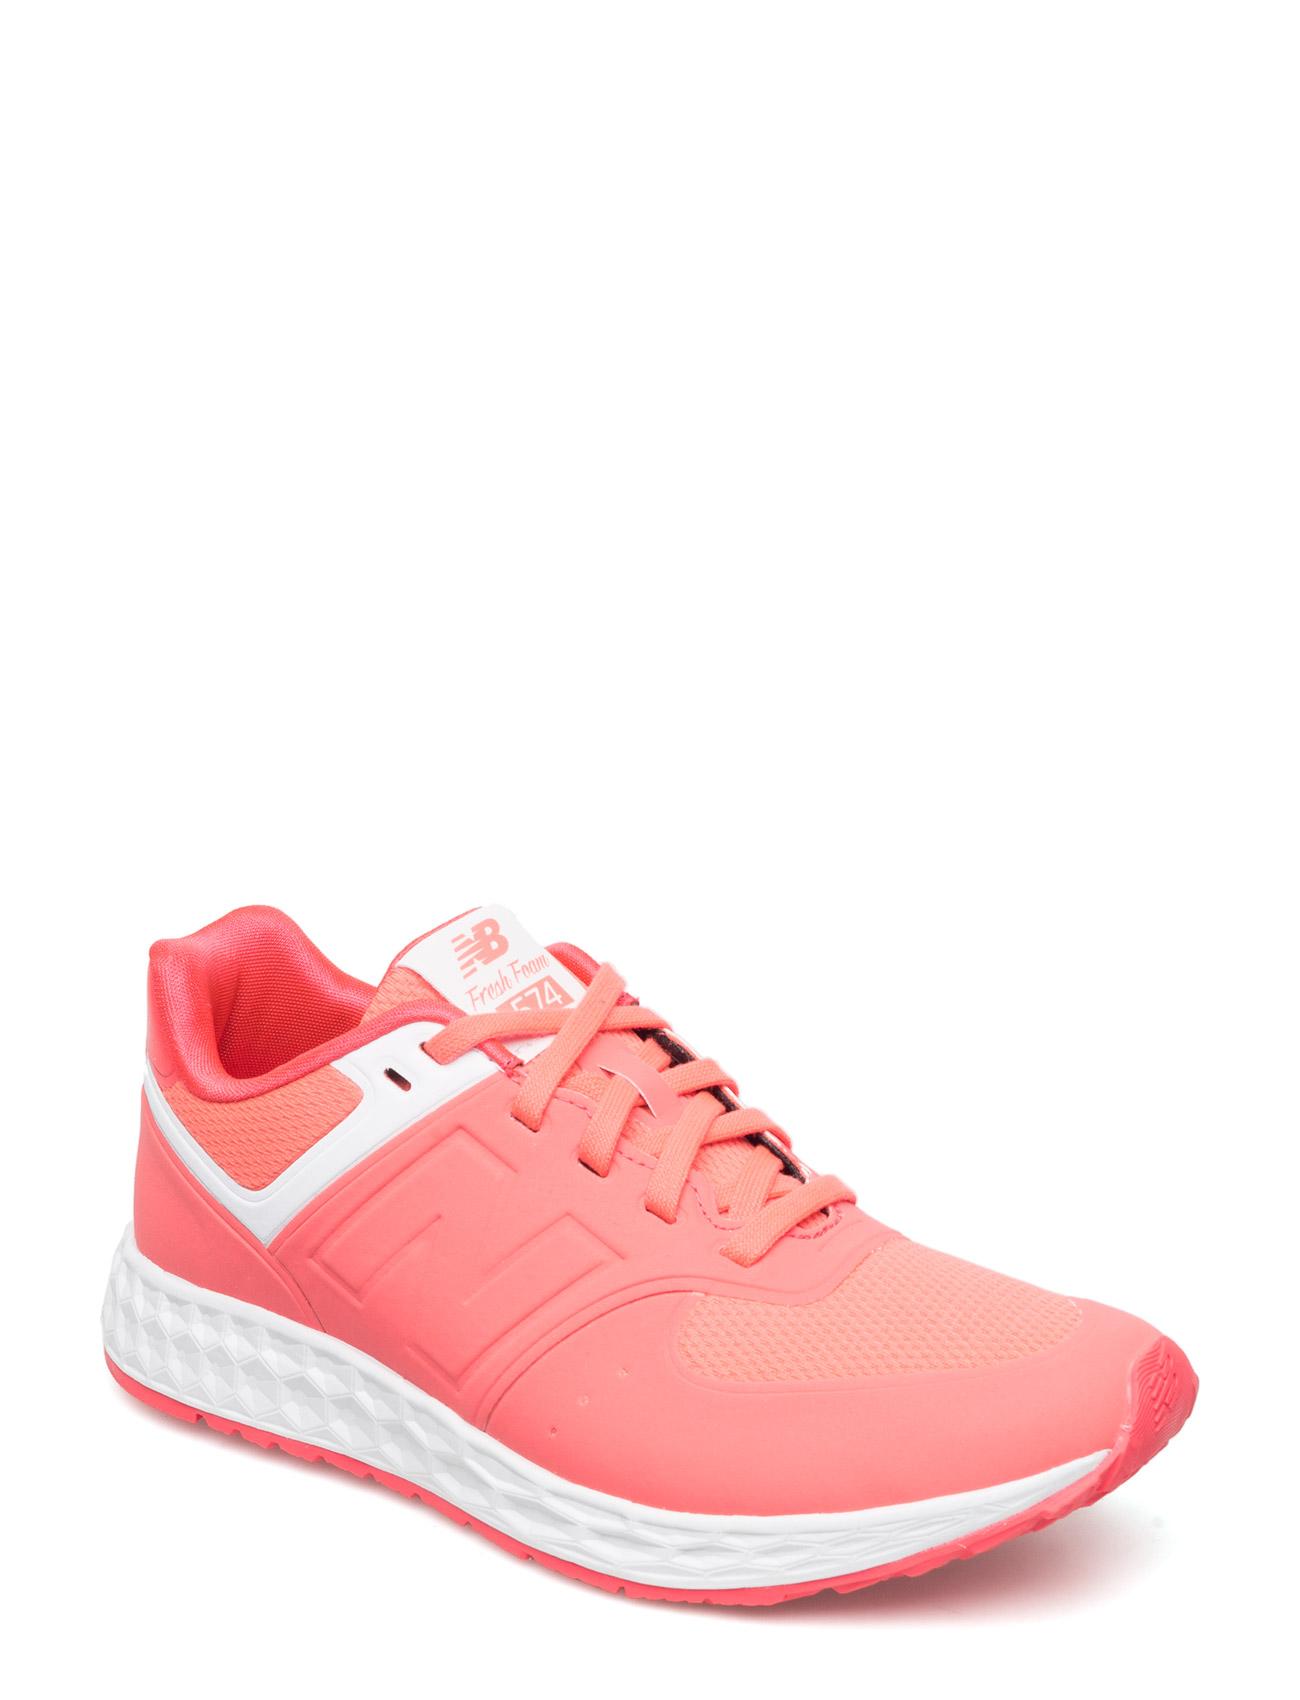 Wfl574bc New Balance Sneakers til Damer i